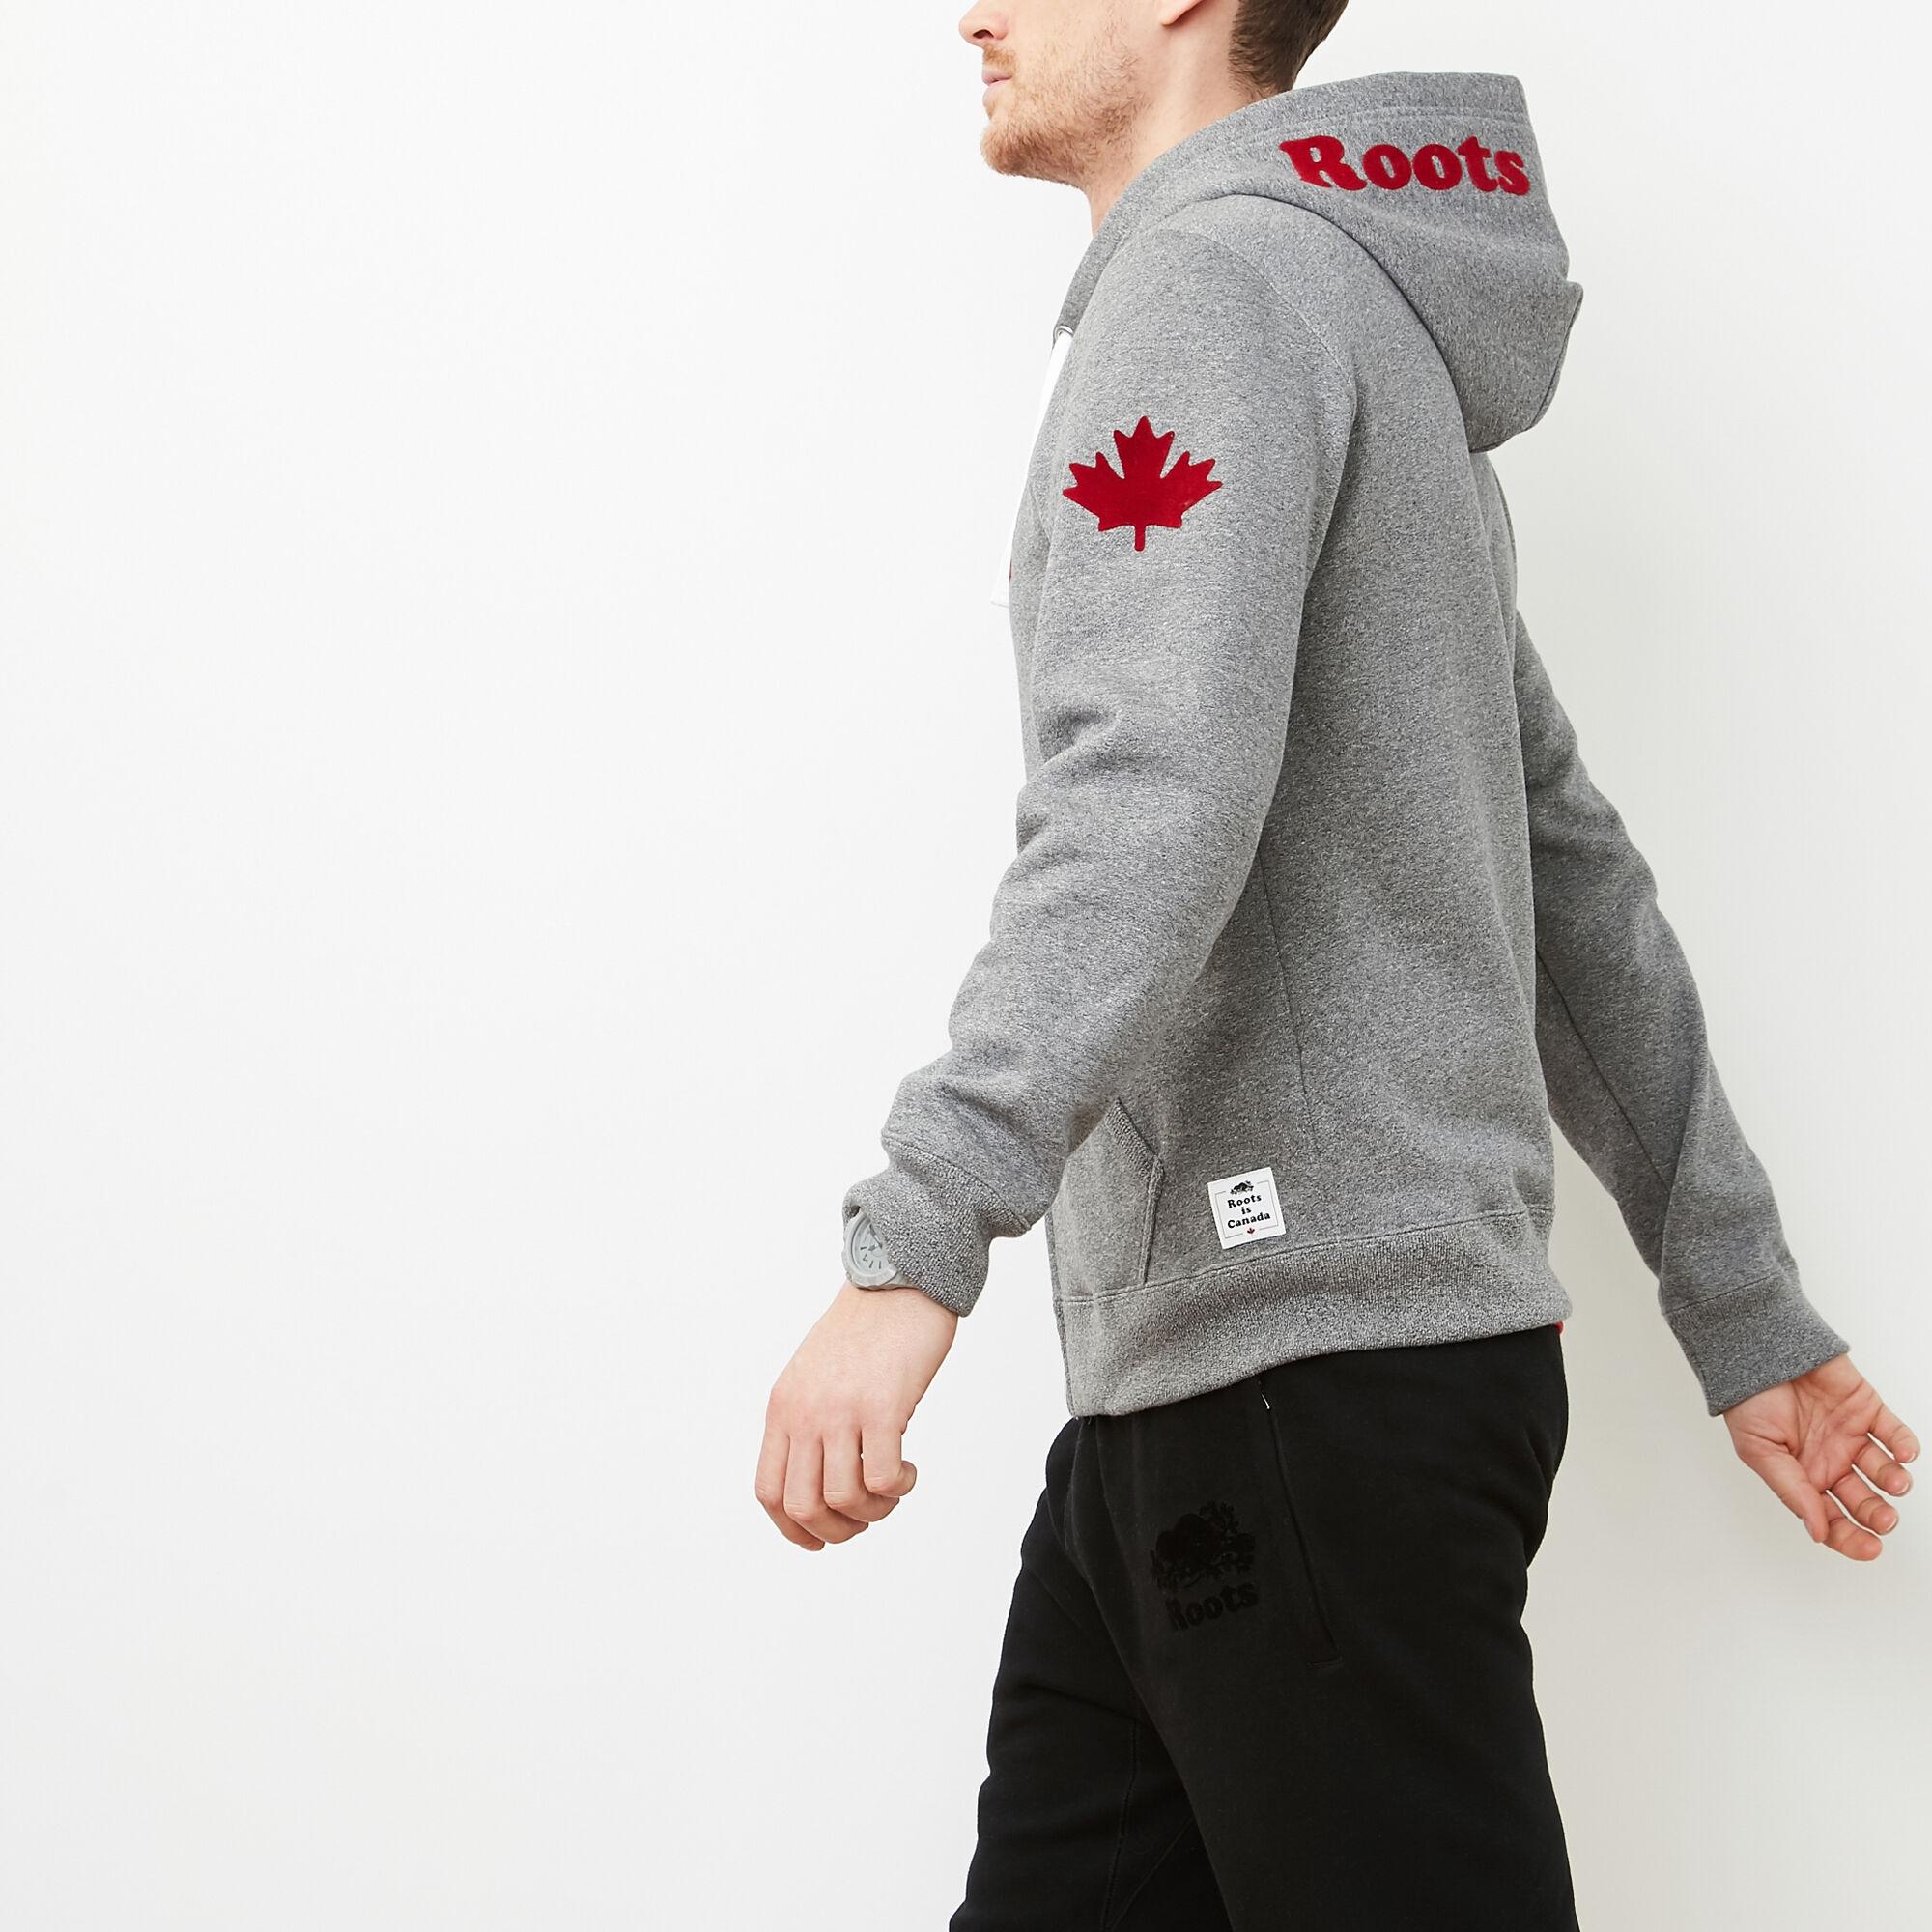 Chand Cap Gpl Cooper Canada